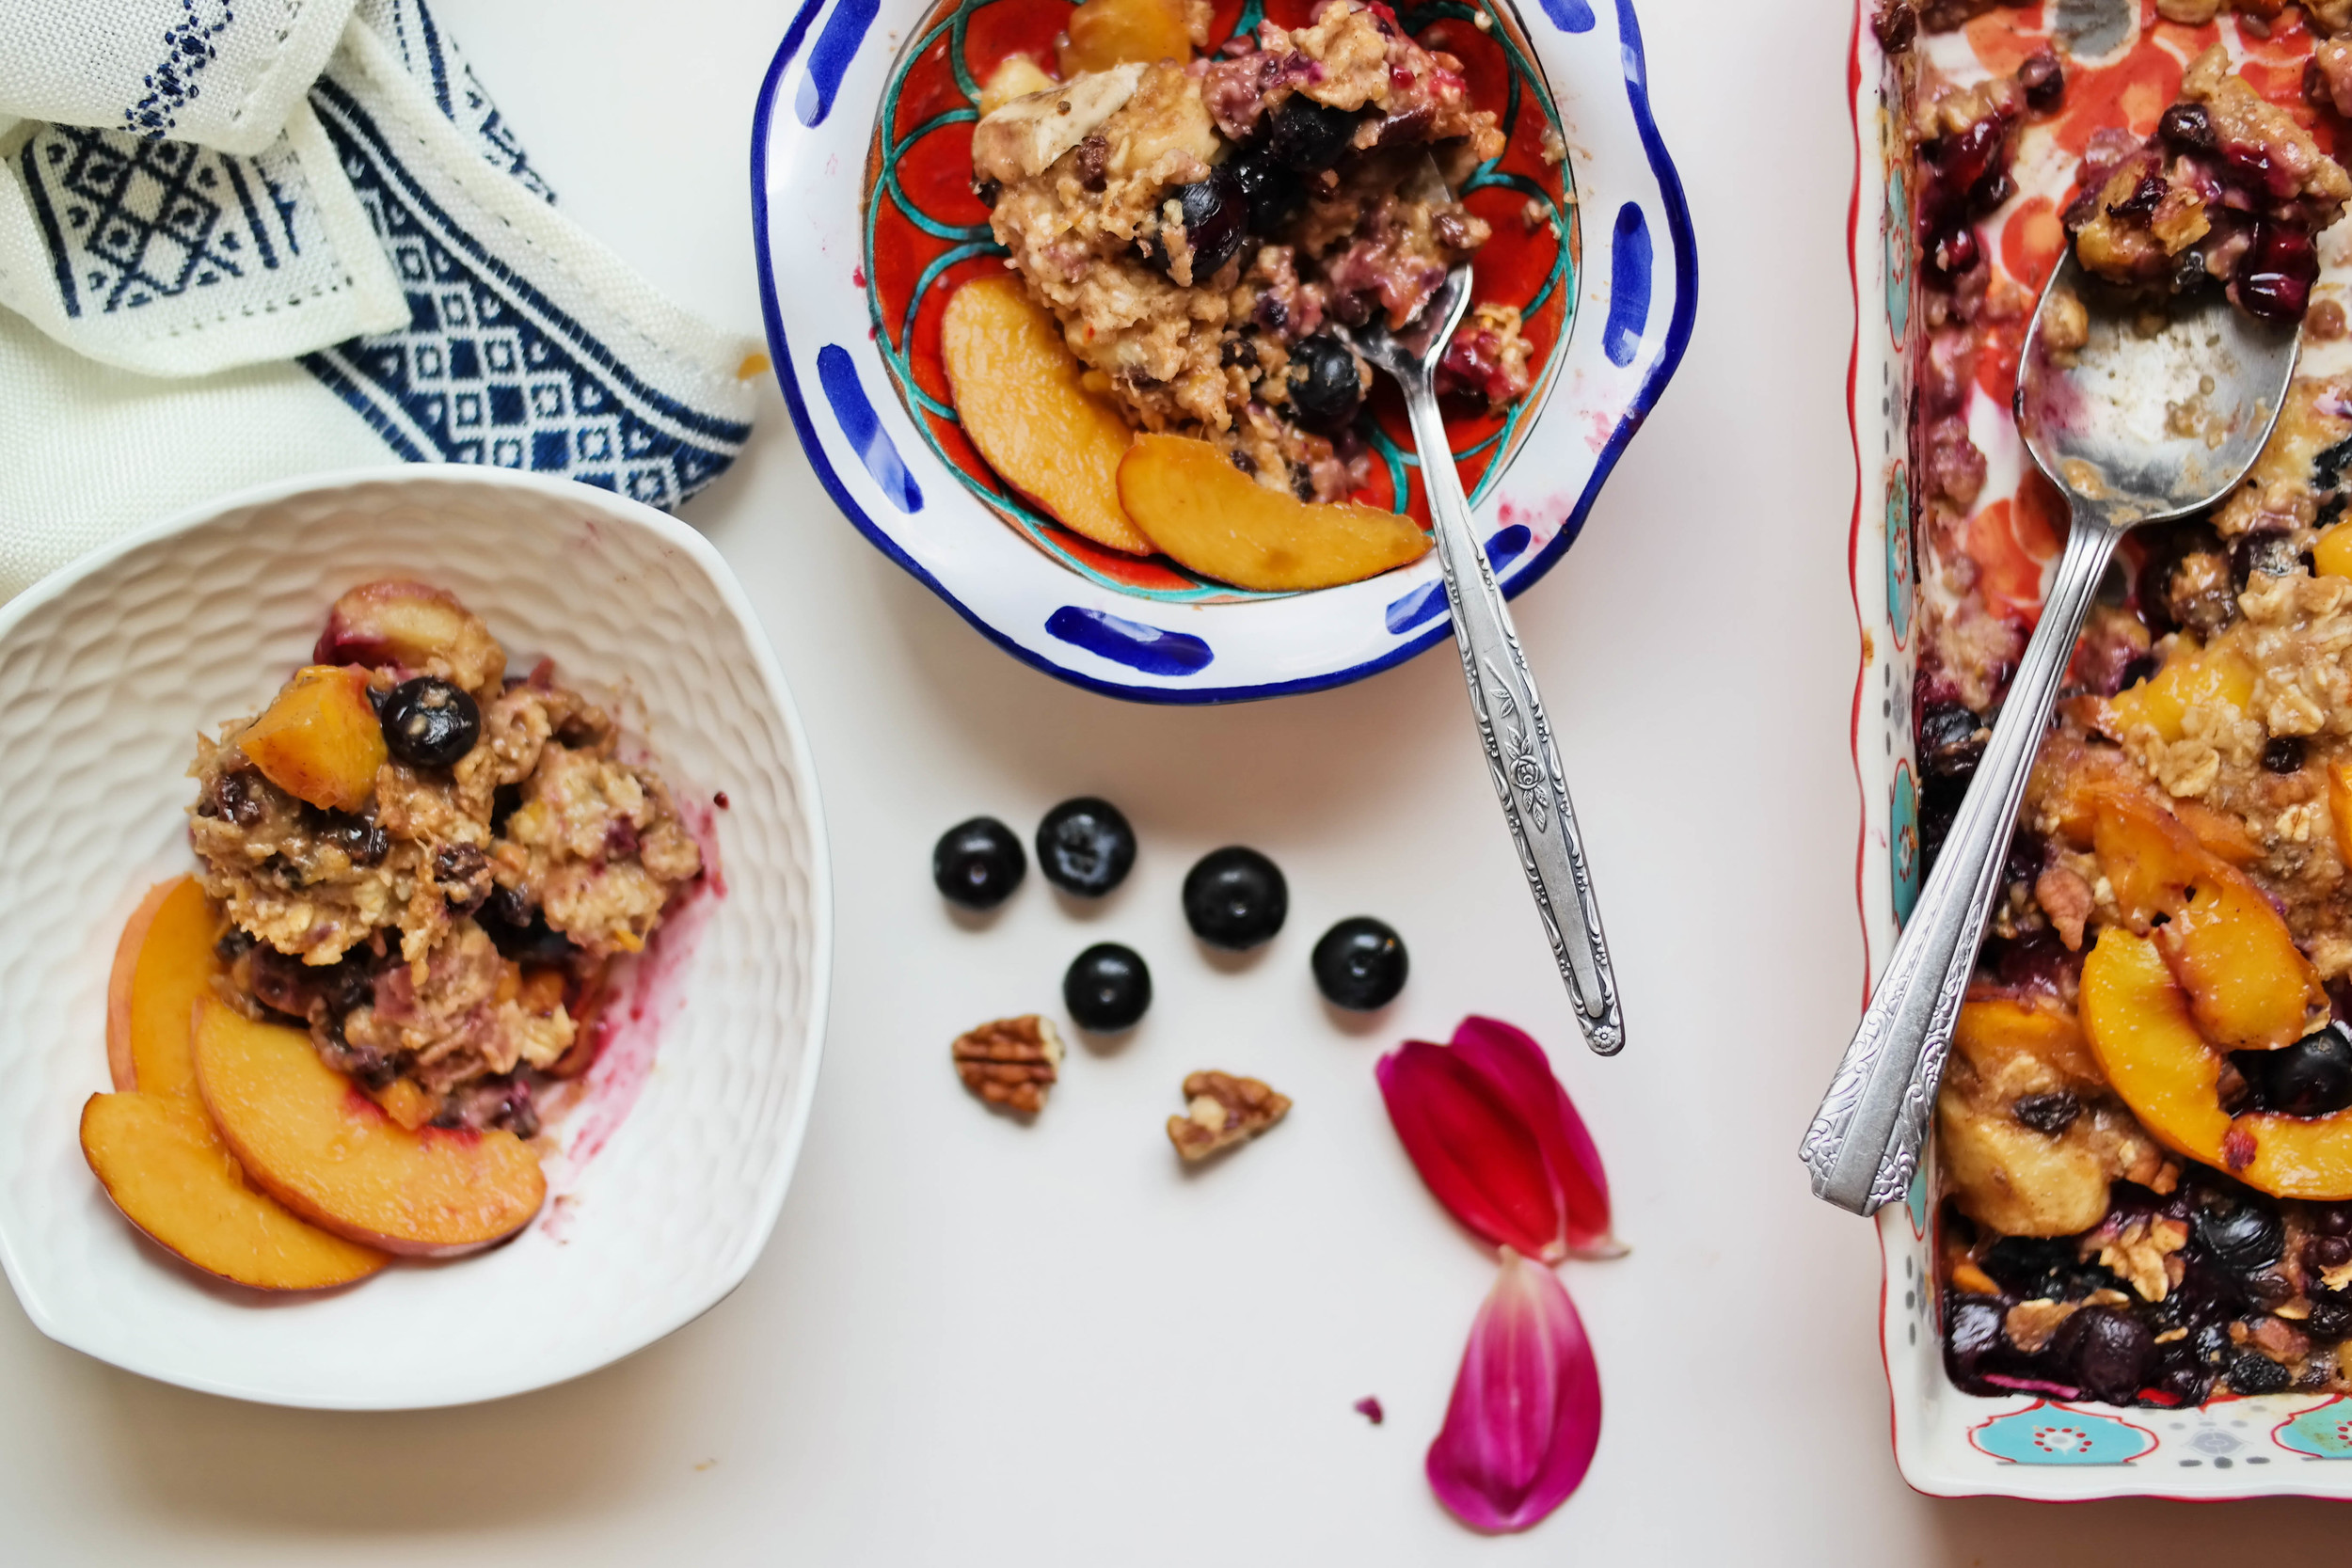 4-Baked-Peach-And-Blueberry-Oatmeal | www.8thandlake.com